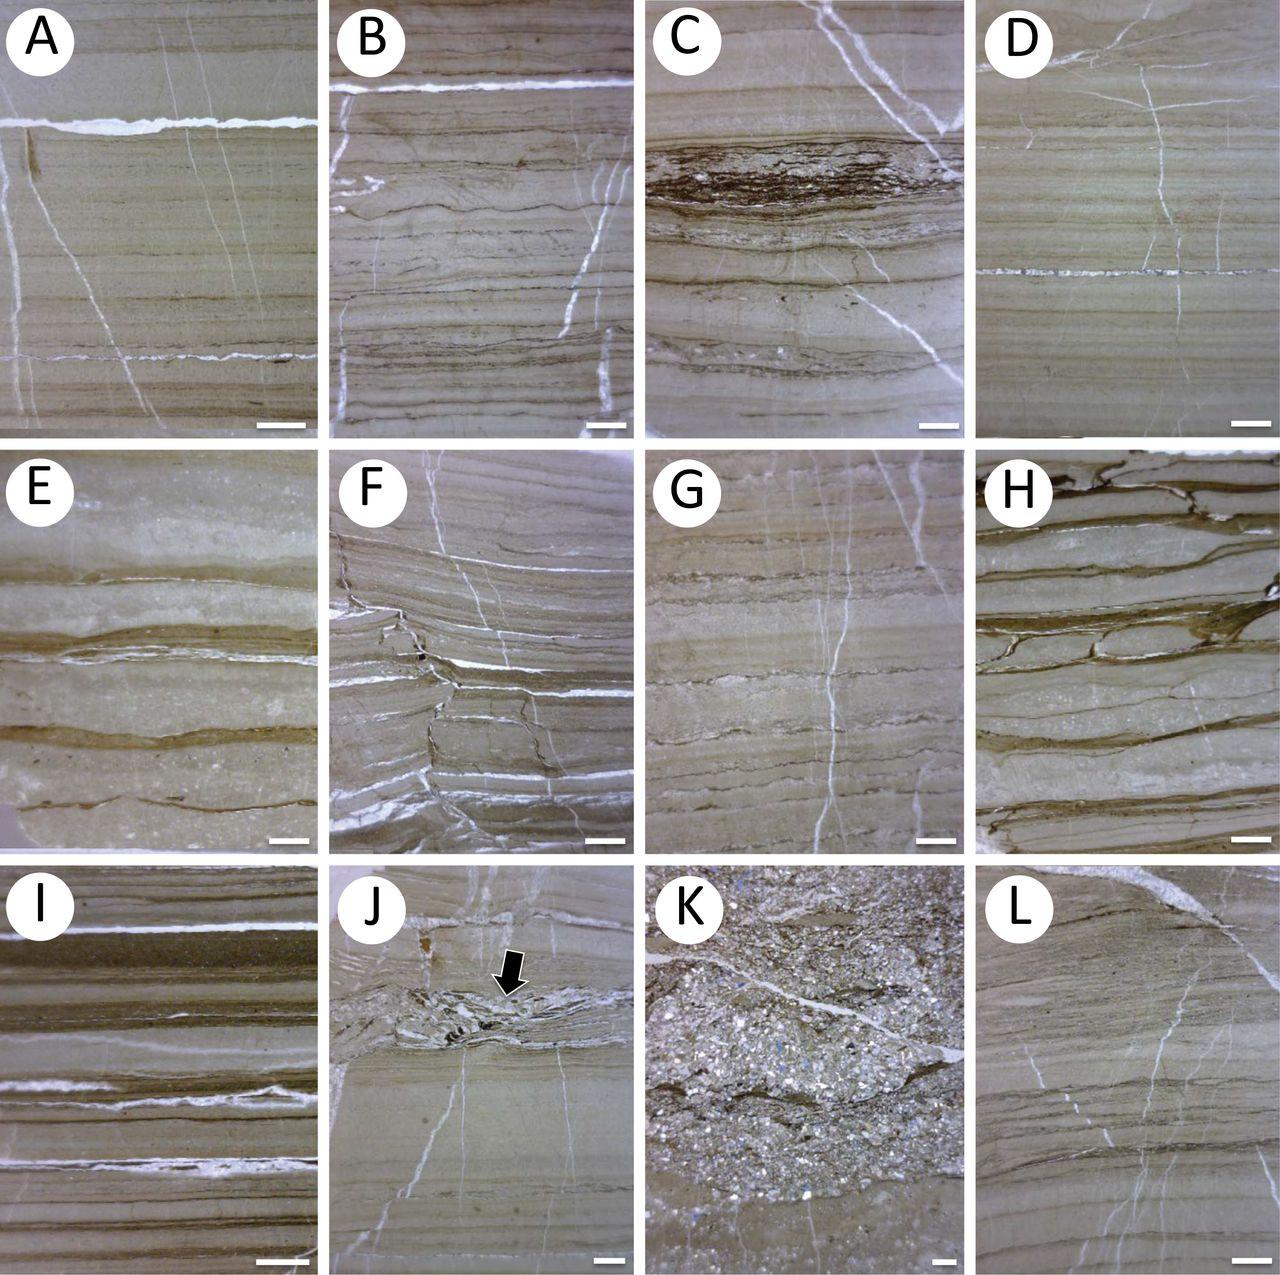 higgins hardwood flooring nh of lacustrine deposits in the karheen formation fortify links between throughout view largedownload slide